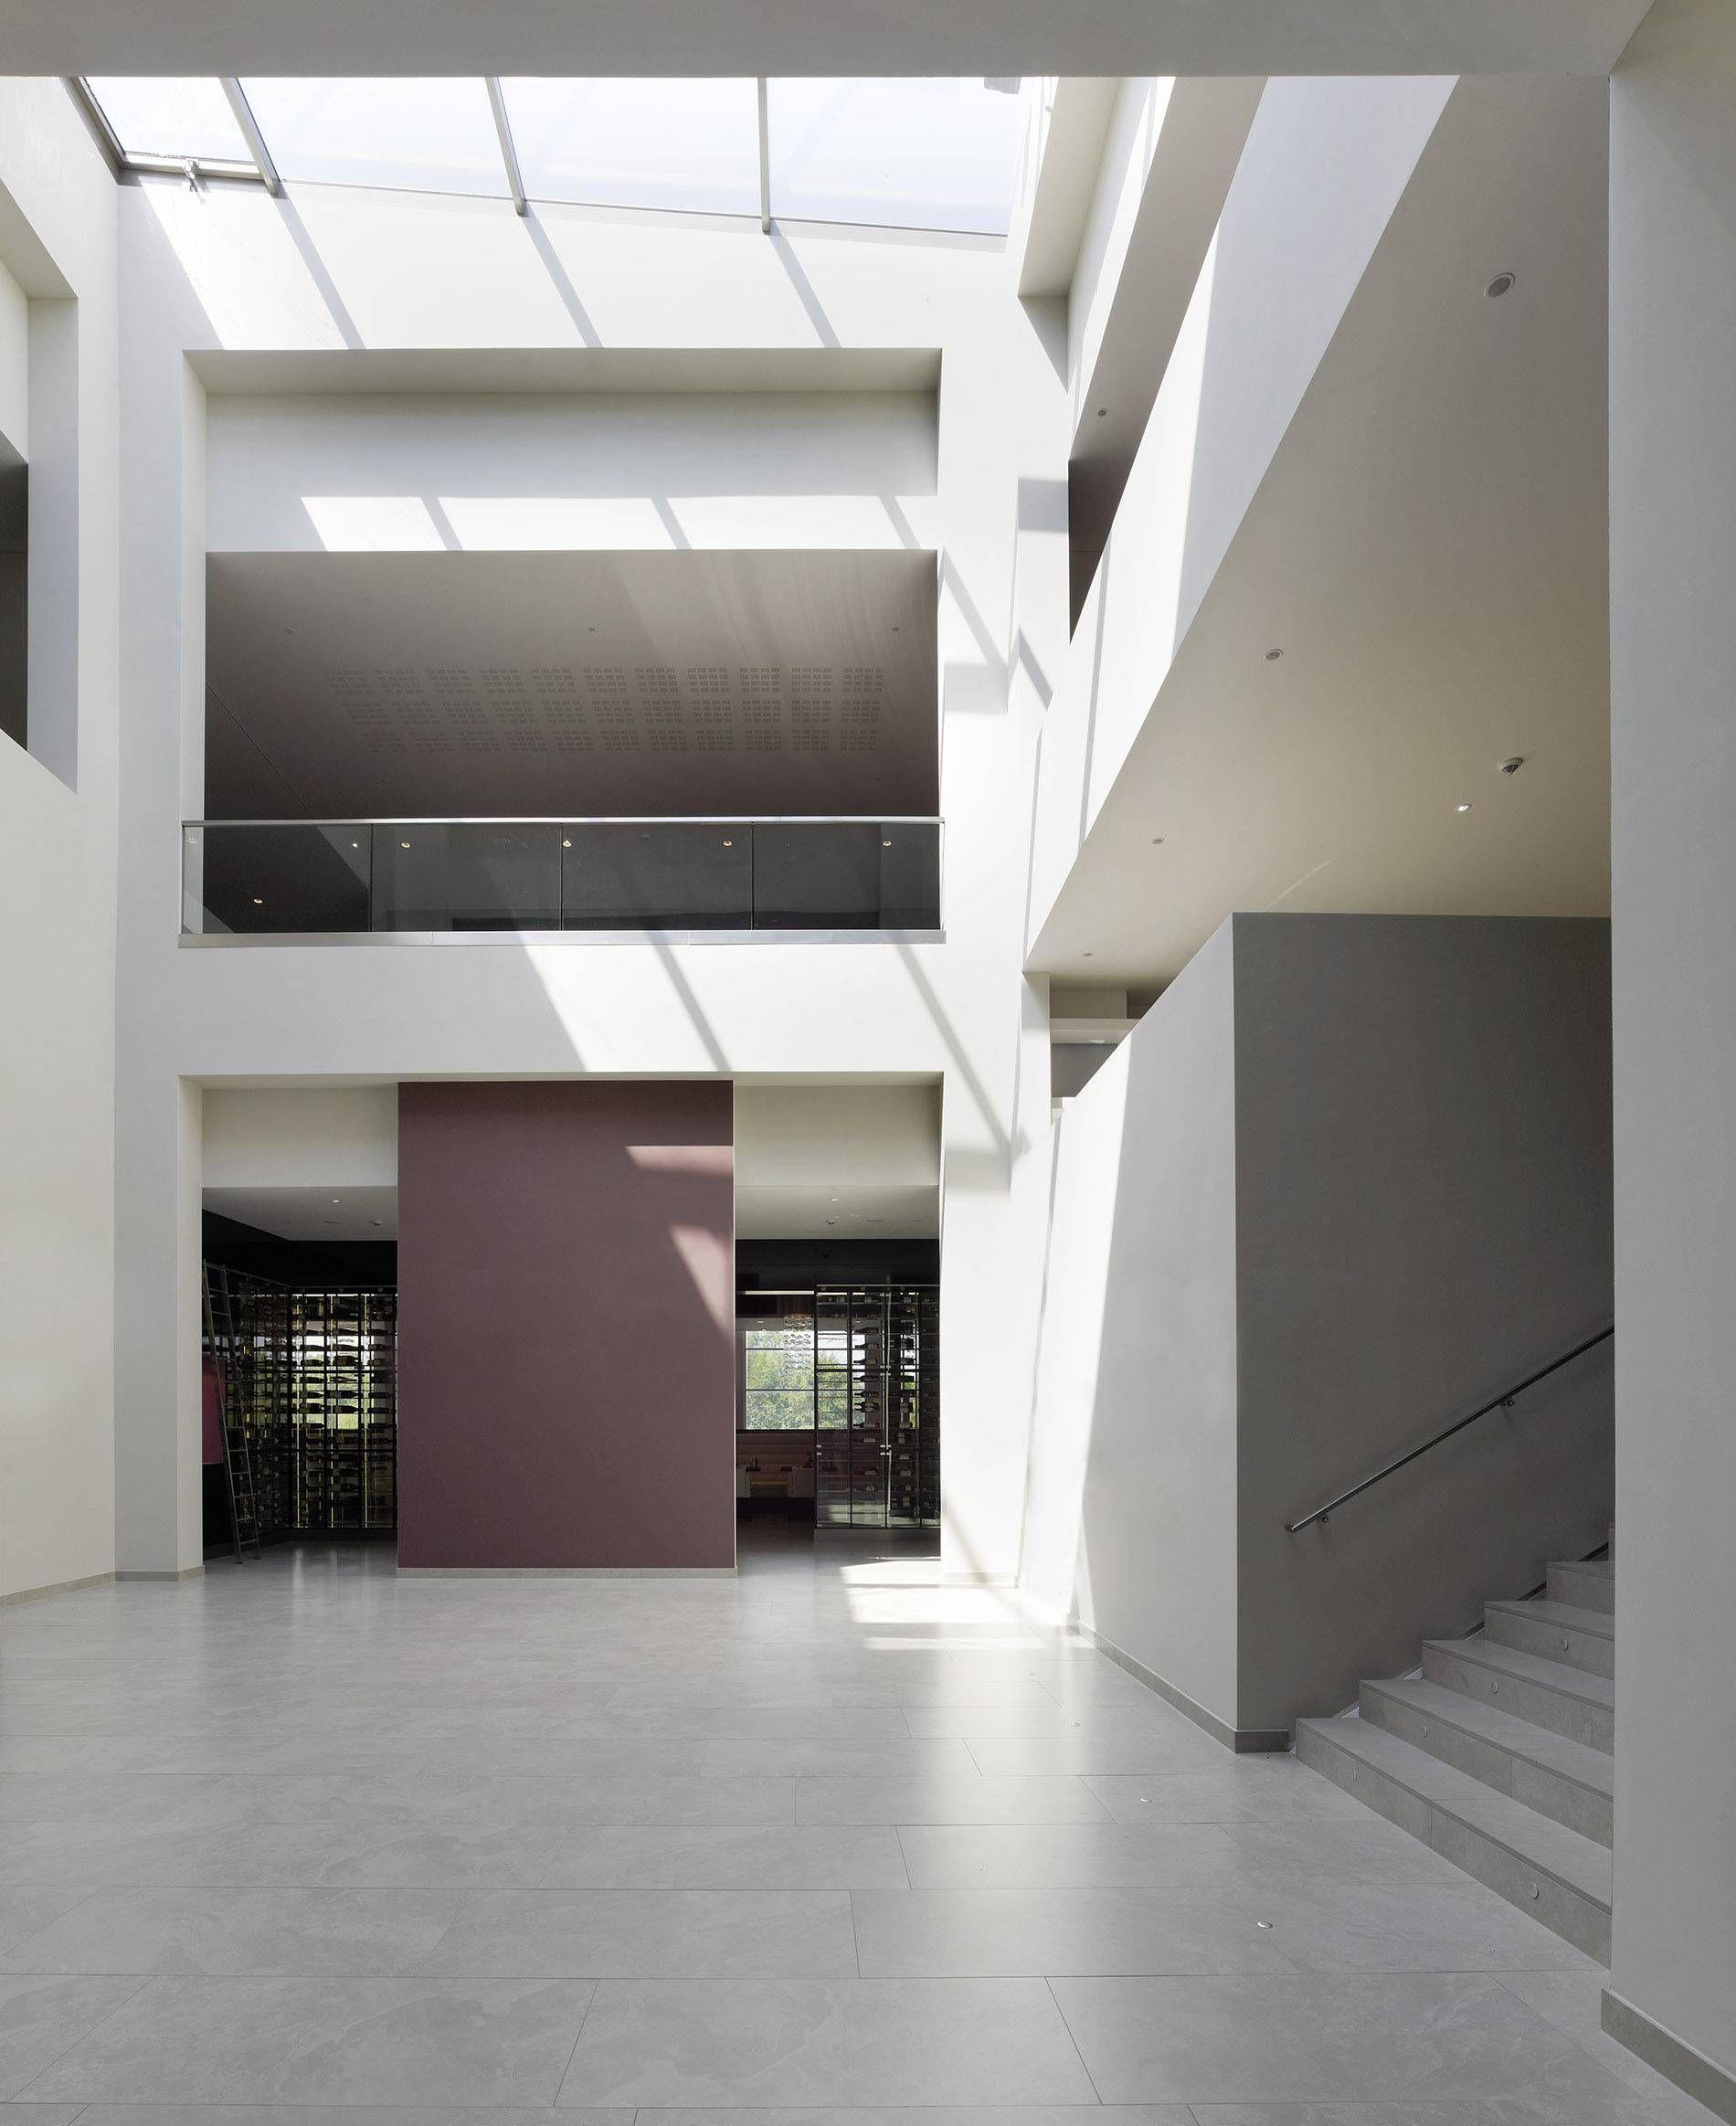 Airporthotel Van der Falk Düsseldorf, O&O Baukunst Bau